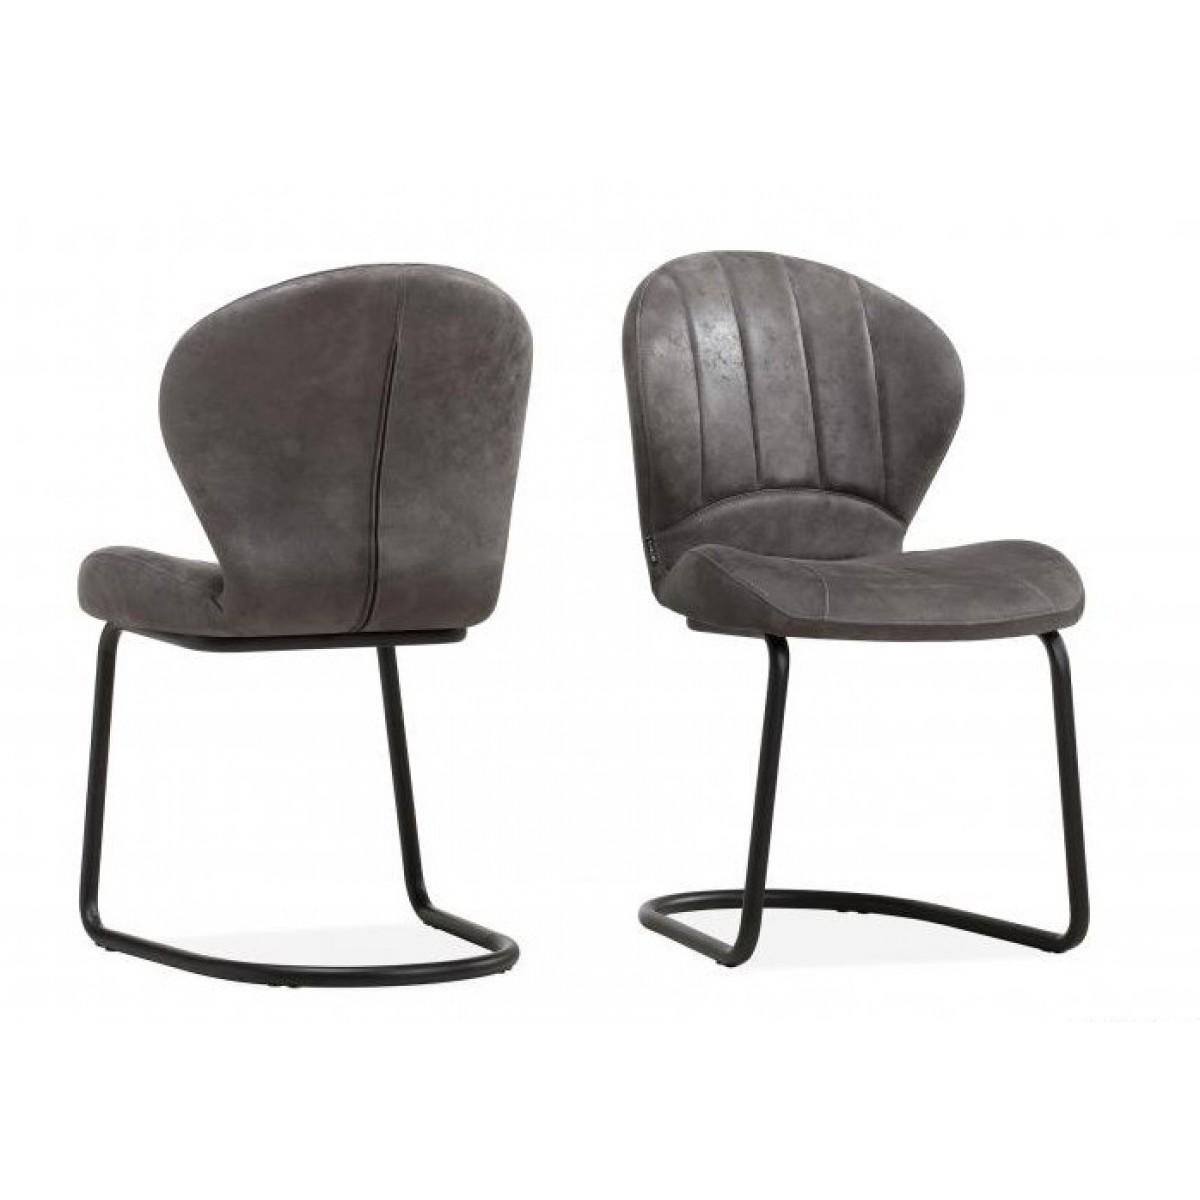 Boter-stoel-eetkamerstoel-metalen-frame-softyl-steel